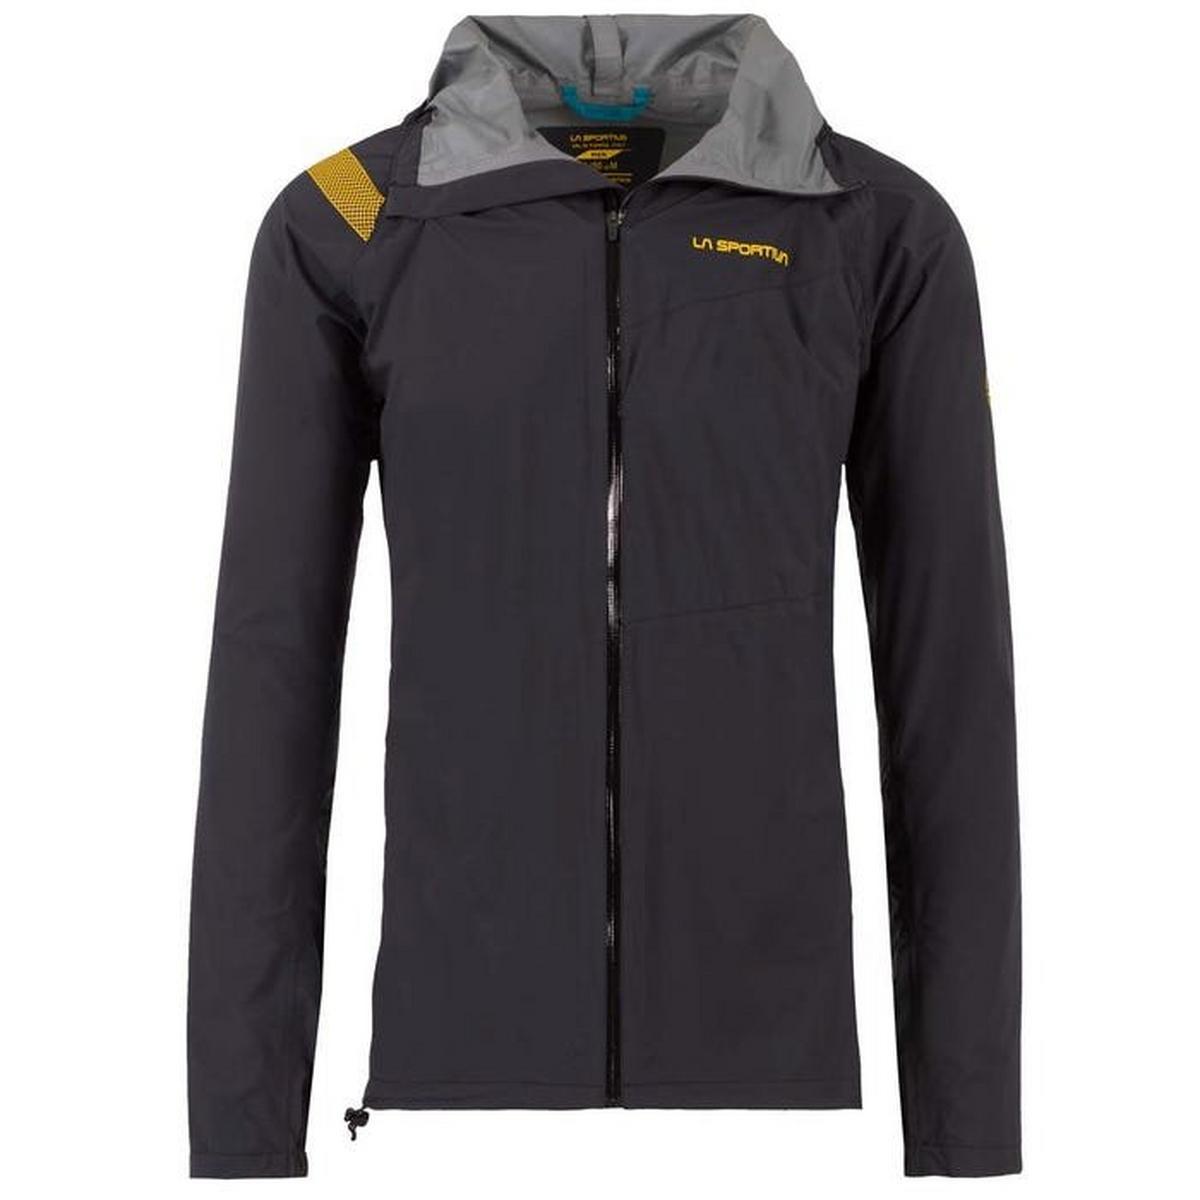 La Sportiva Men's Run Jacket - Black